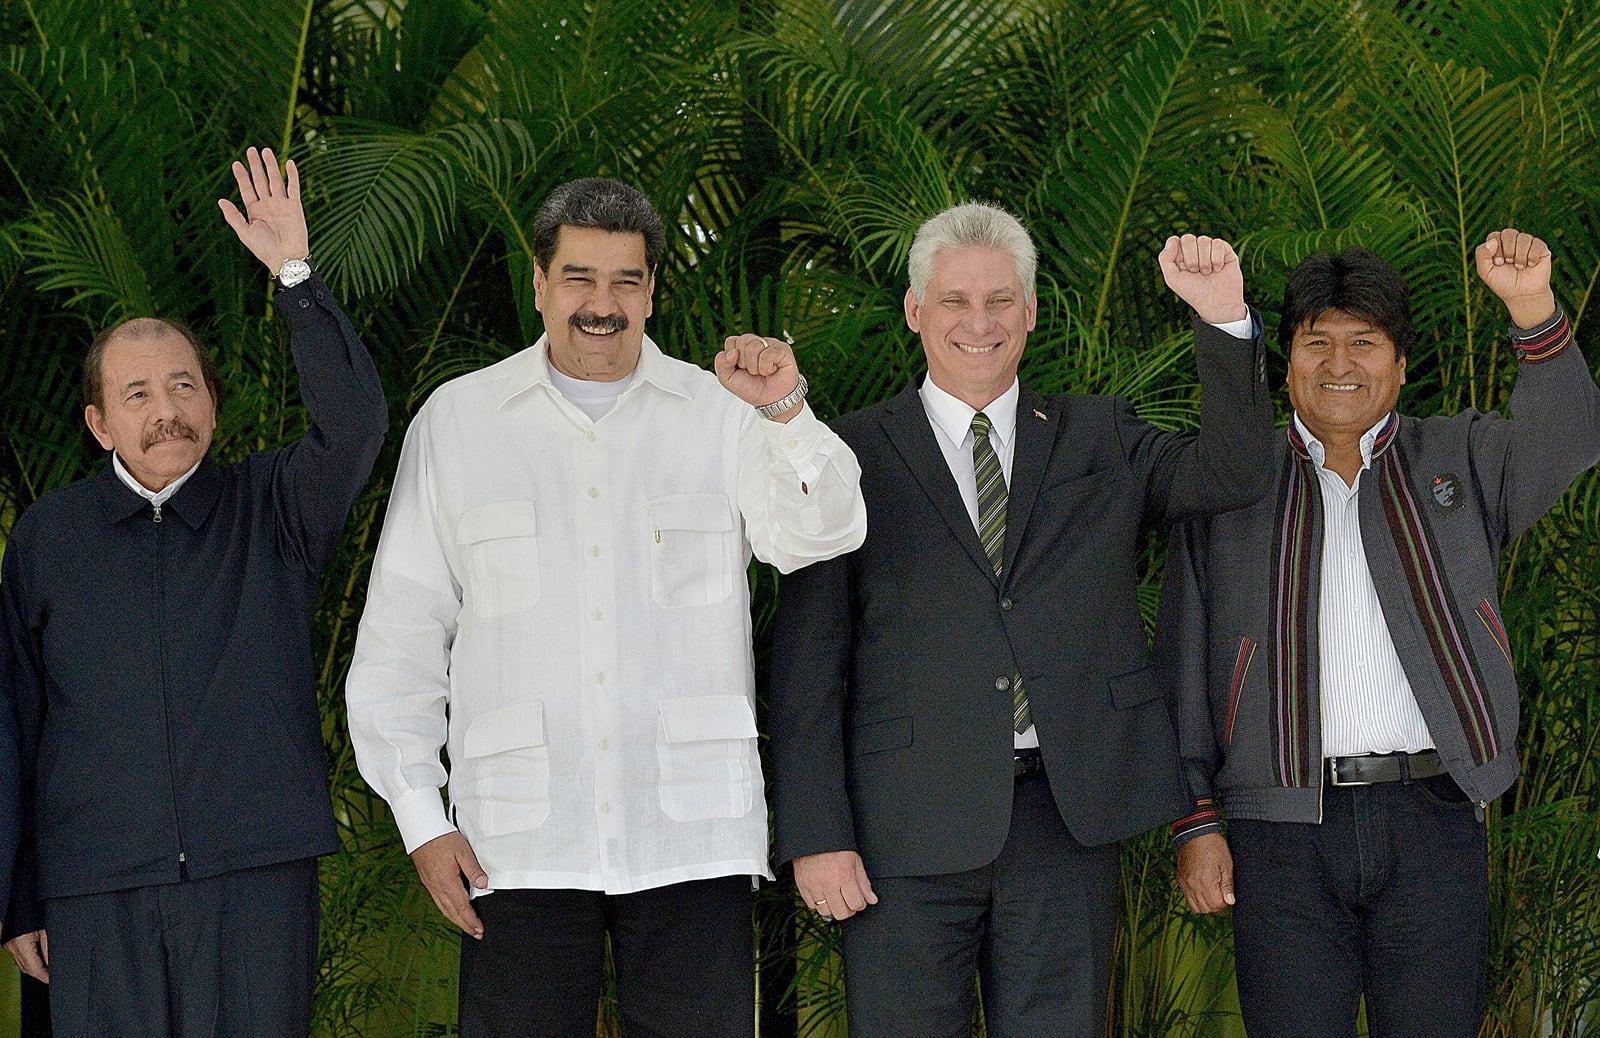 El president de Nicaragua, Daniel Ortega; de Venezuela, Nicolás Maduro; de Cuba, Miguel Díaz-Canel i de Bolivia, Evo Morales, a una cimera a L'Havana, el 2018. Fotografia de Yamil Lage. AFP. Getty Images.